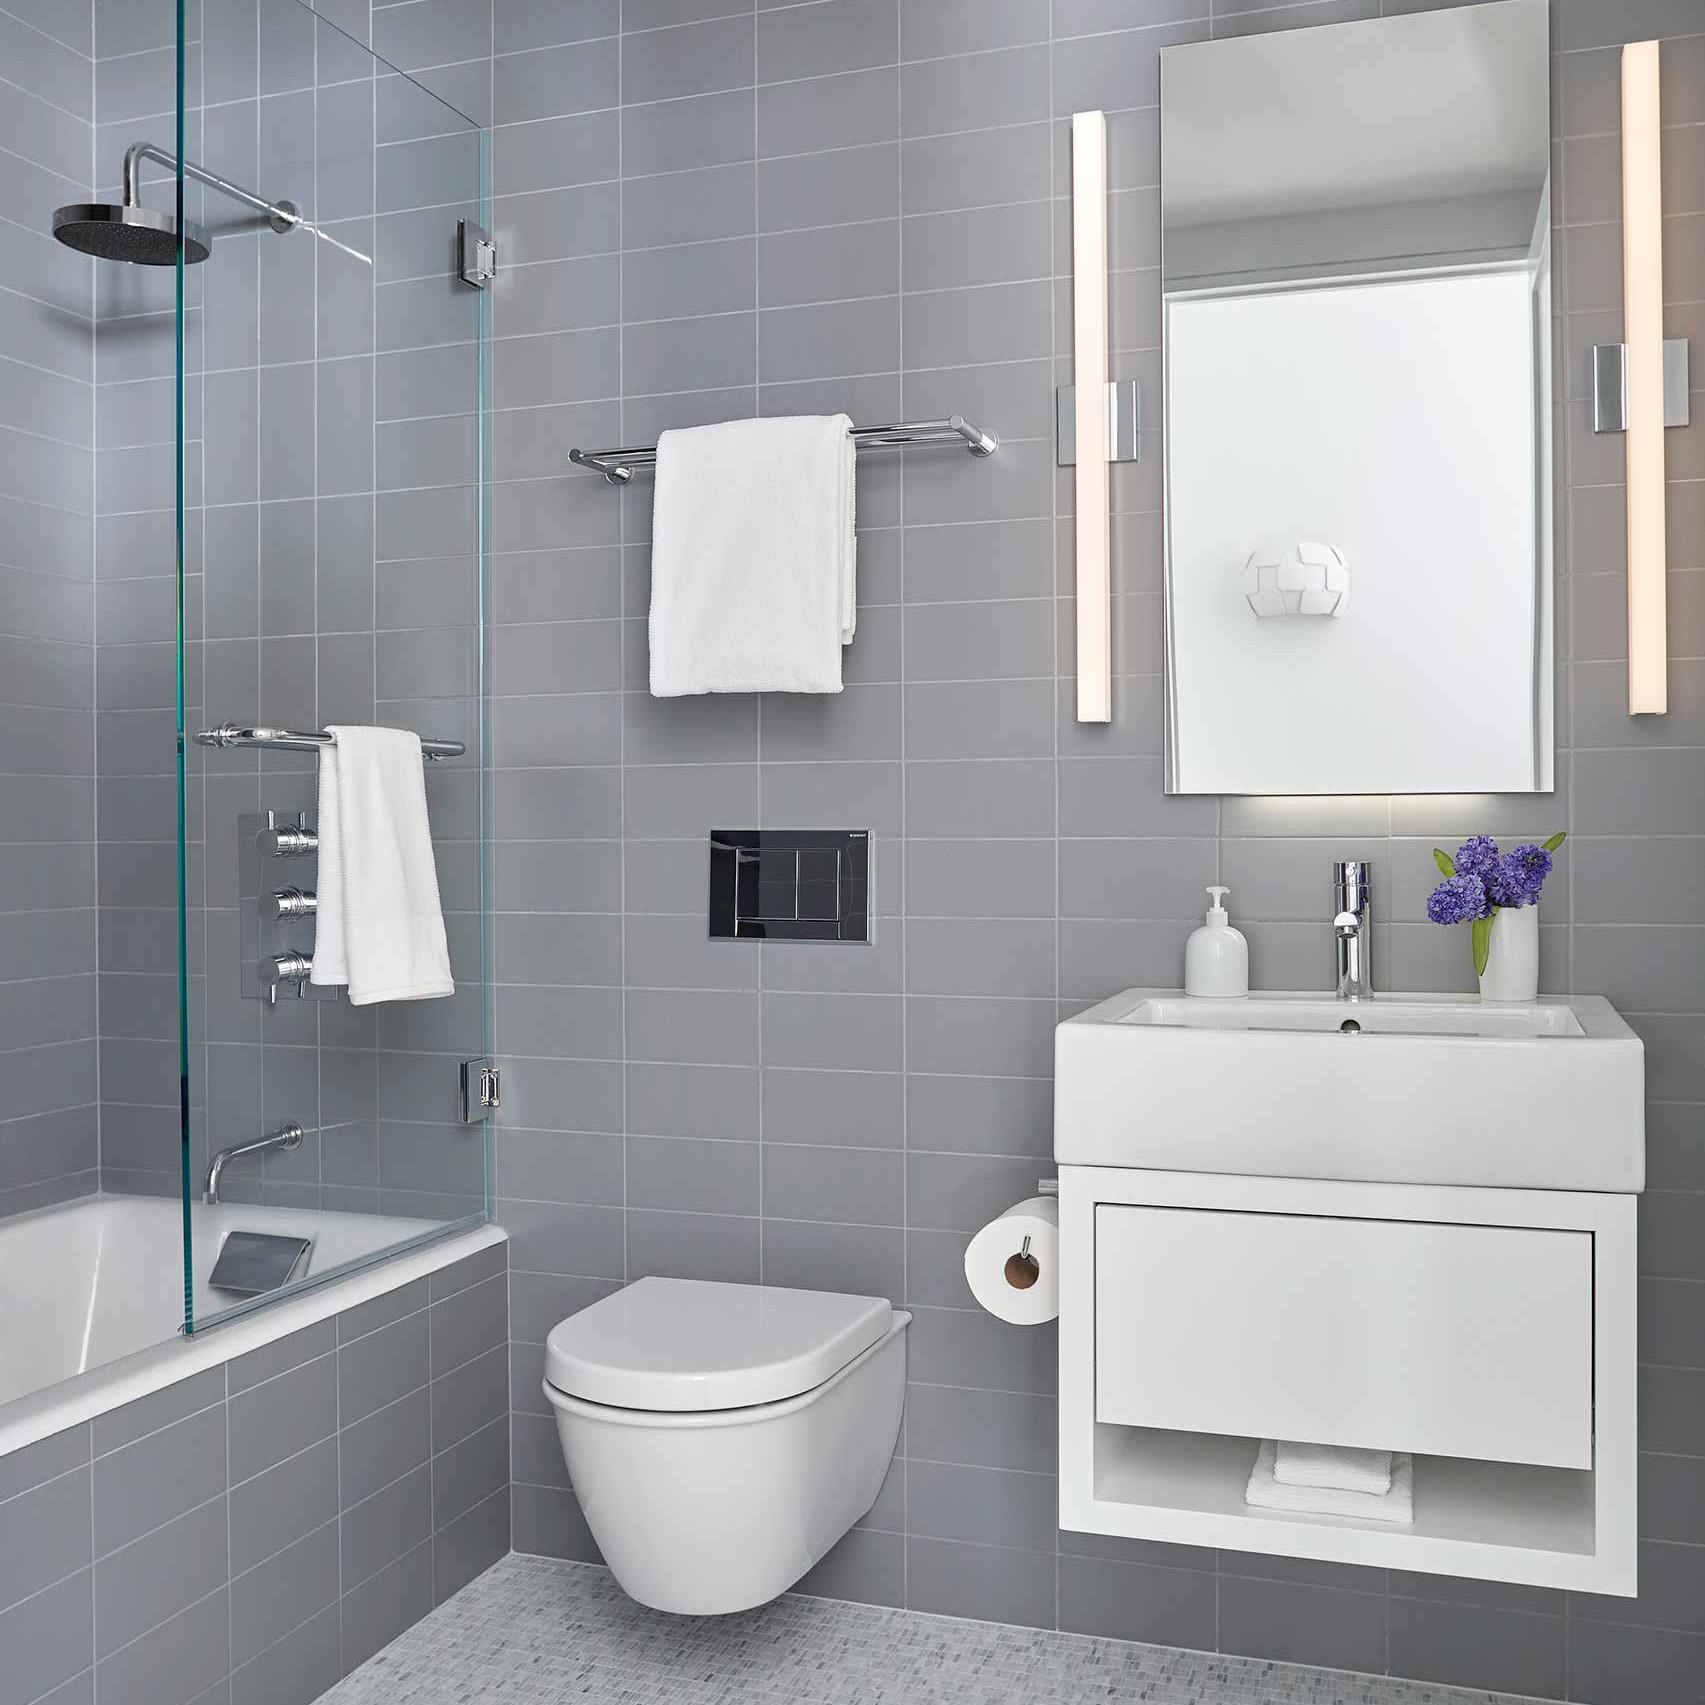 Bathroom with bathtub, walk-in shower, floating toilet and vanity